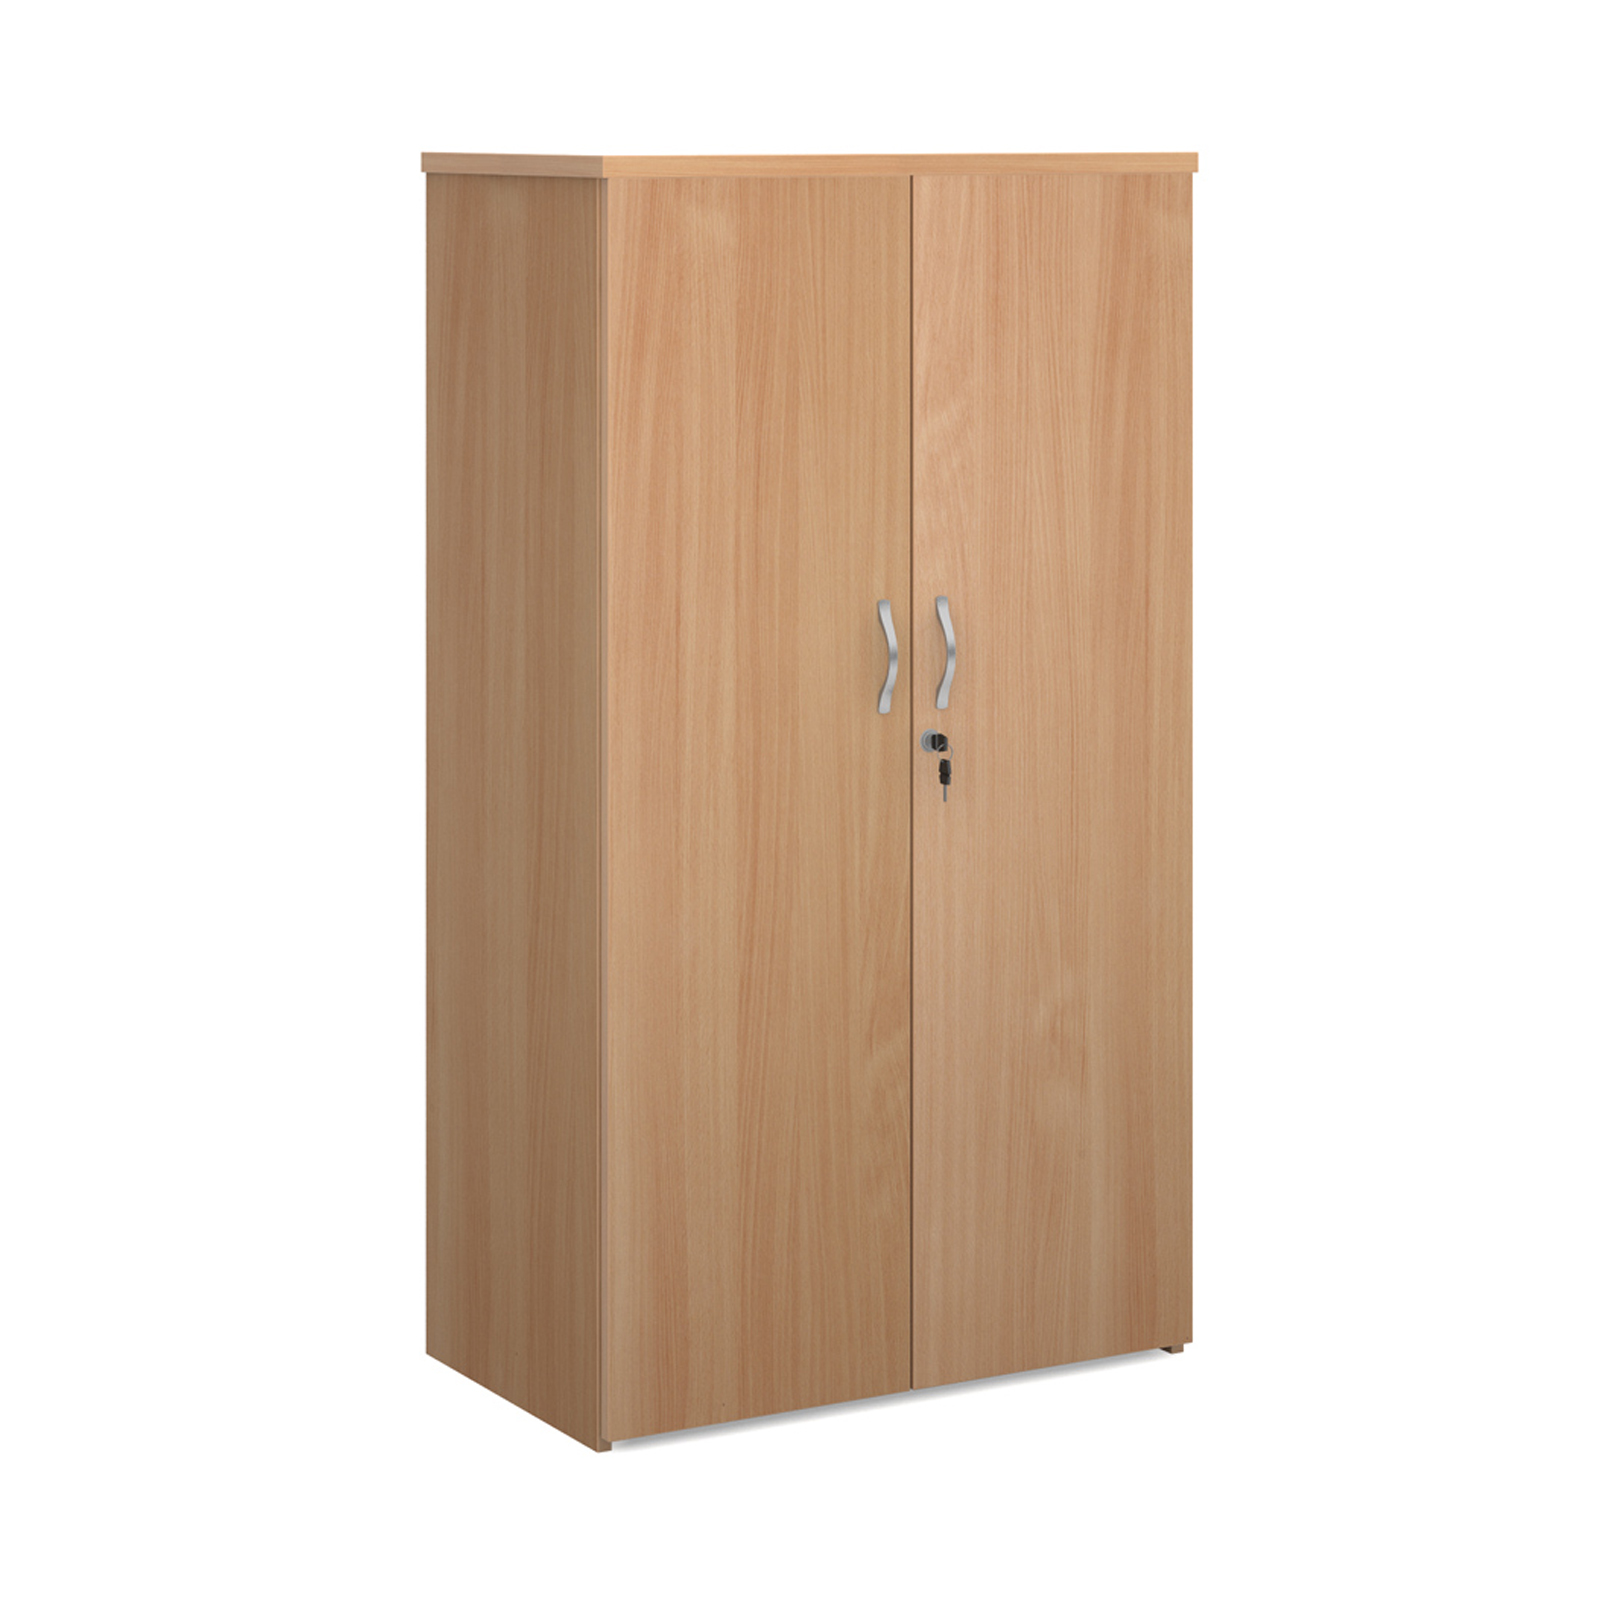 Over 1200mm High Universal double door cupboard 1440mm high with 3 shelves - beech